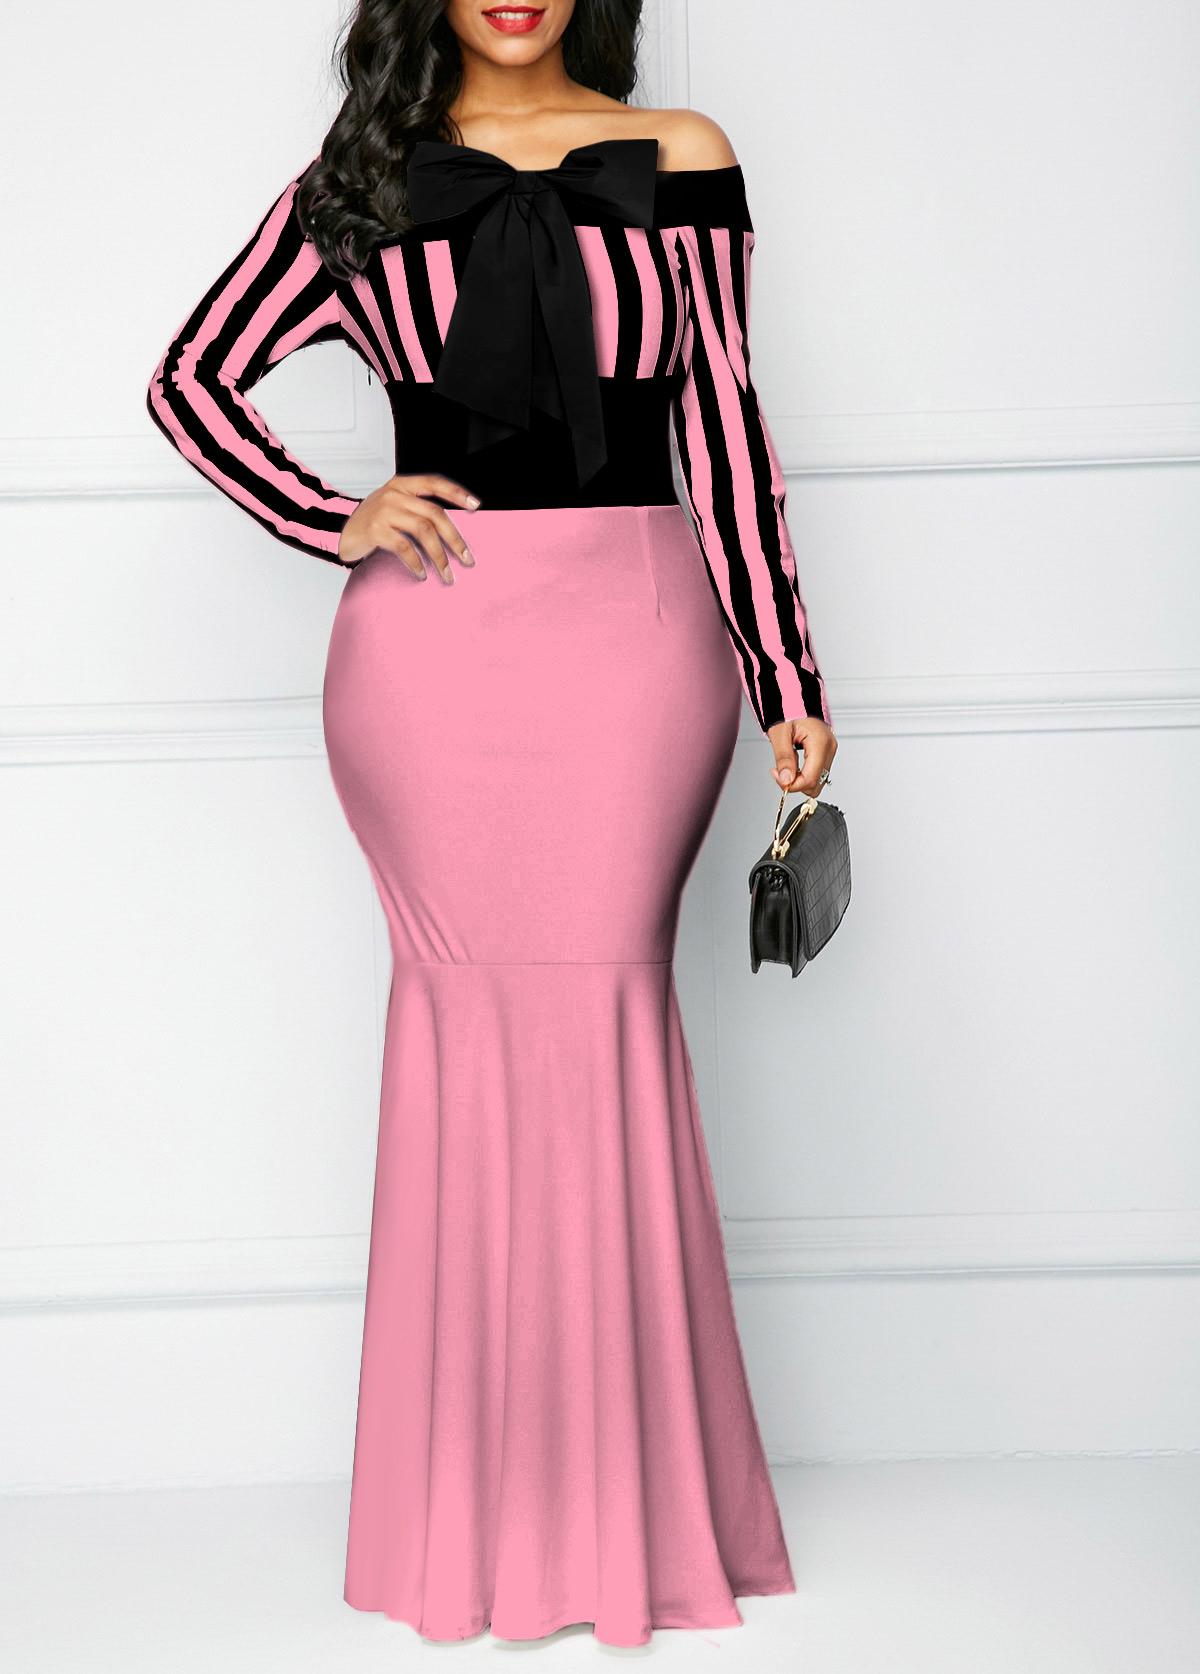 ROTITA Bowknot Off Shoulder Long Sleeve Dress